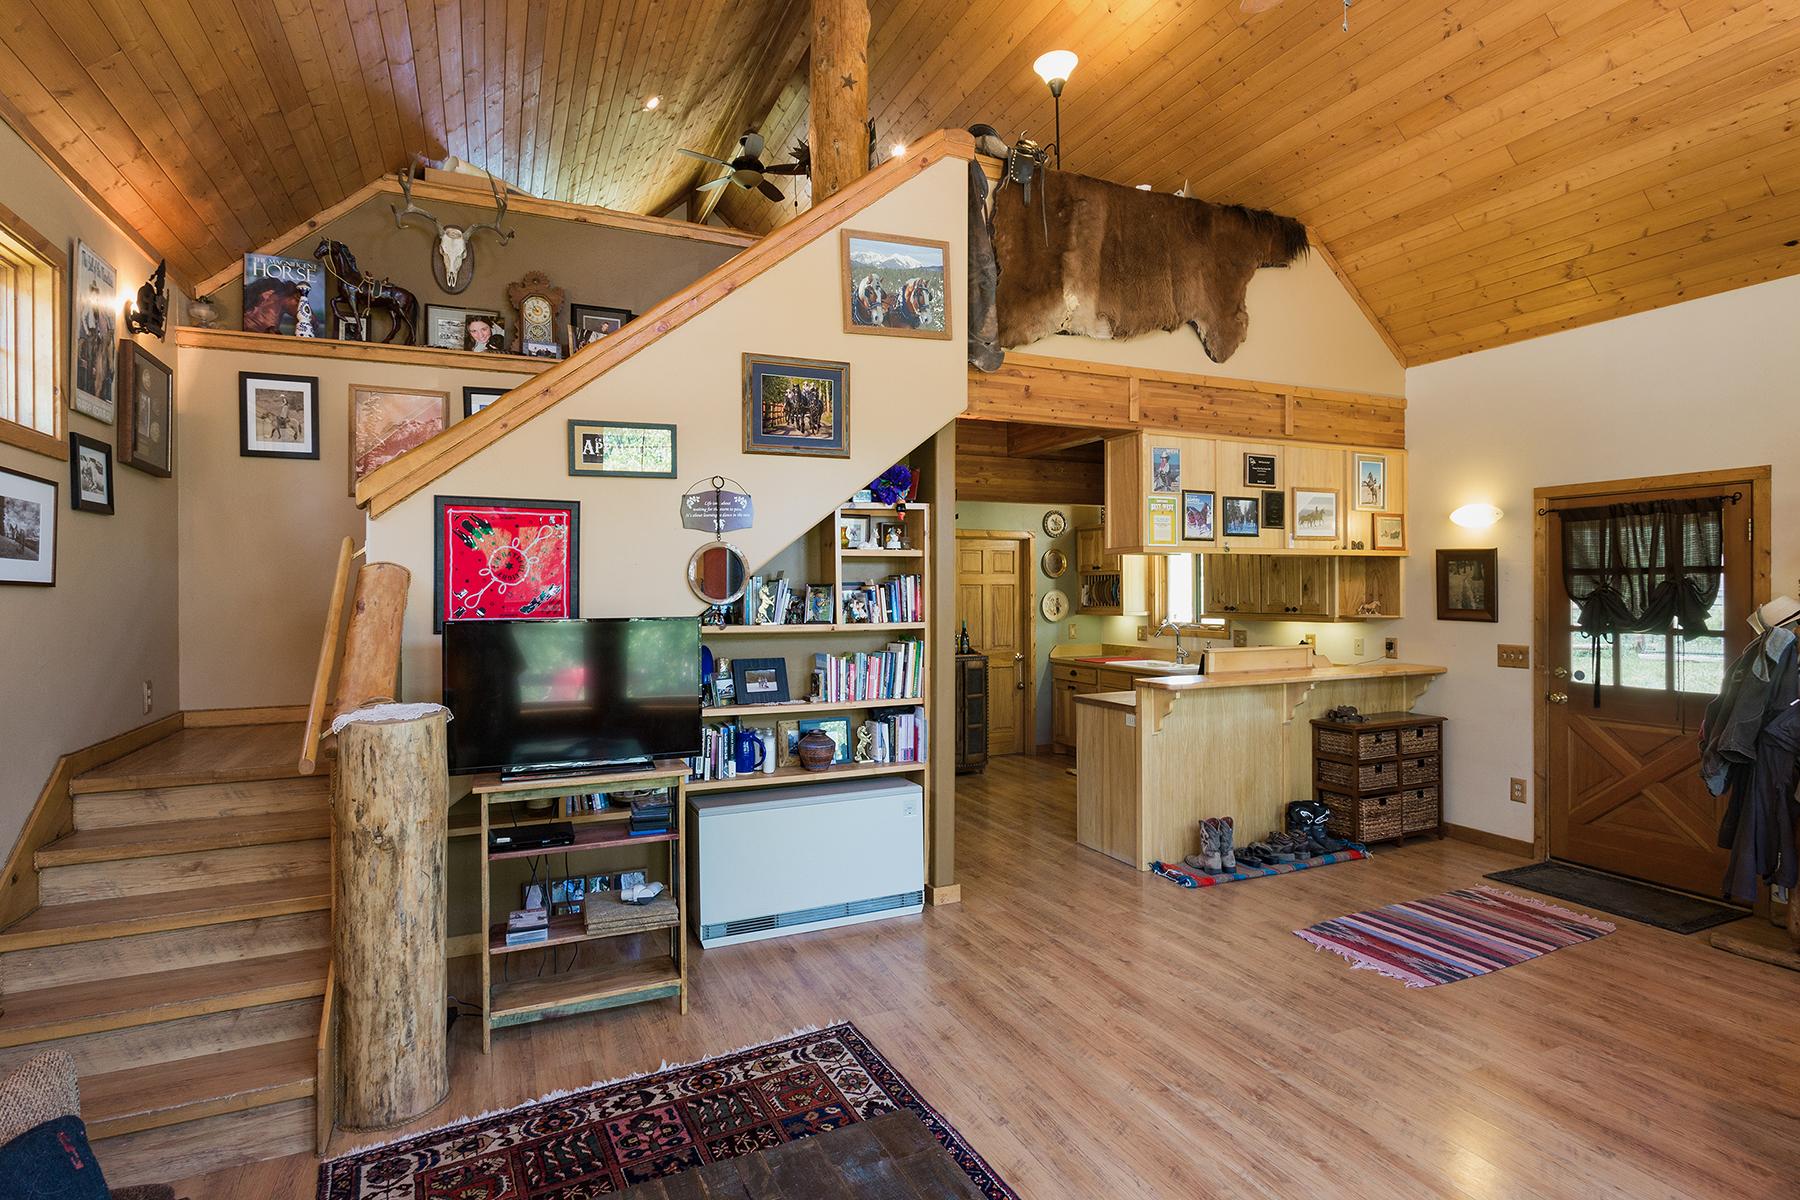 Additional photo for property listing at Rapp Corral 51 Haviland Lake Road Durango, Colorado 81301 Estados Unidos